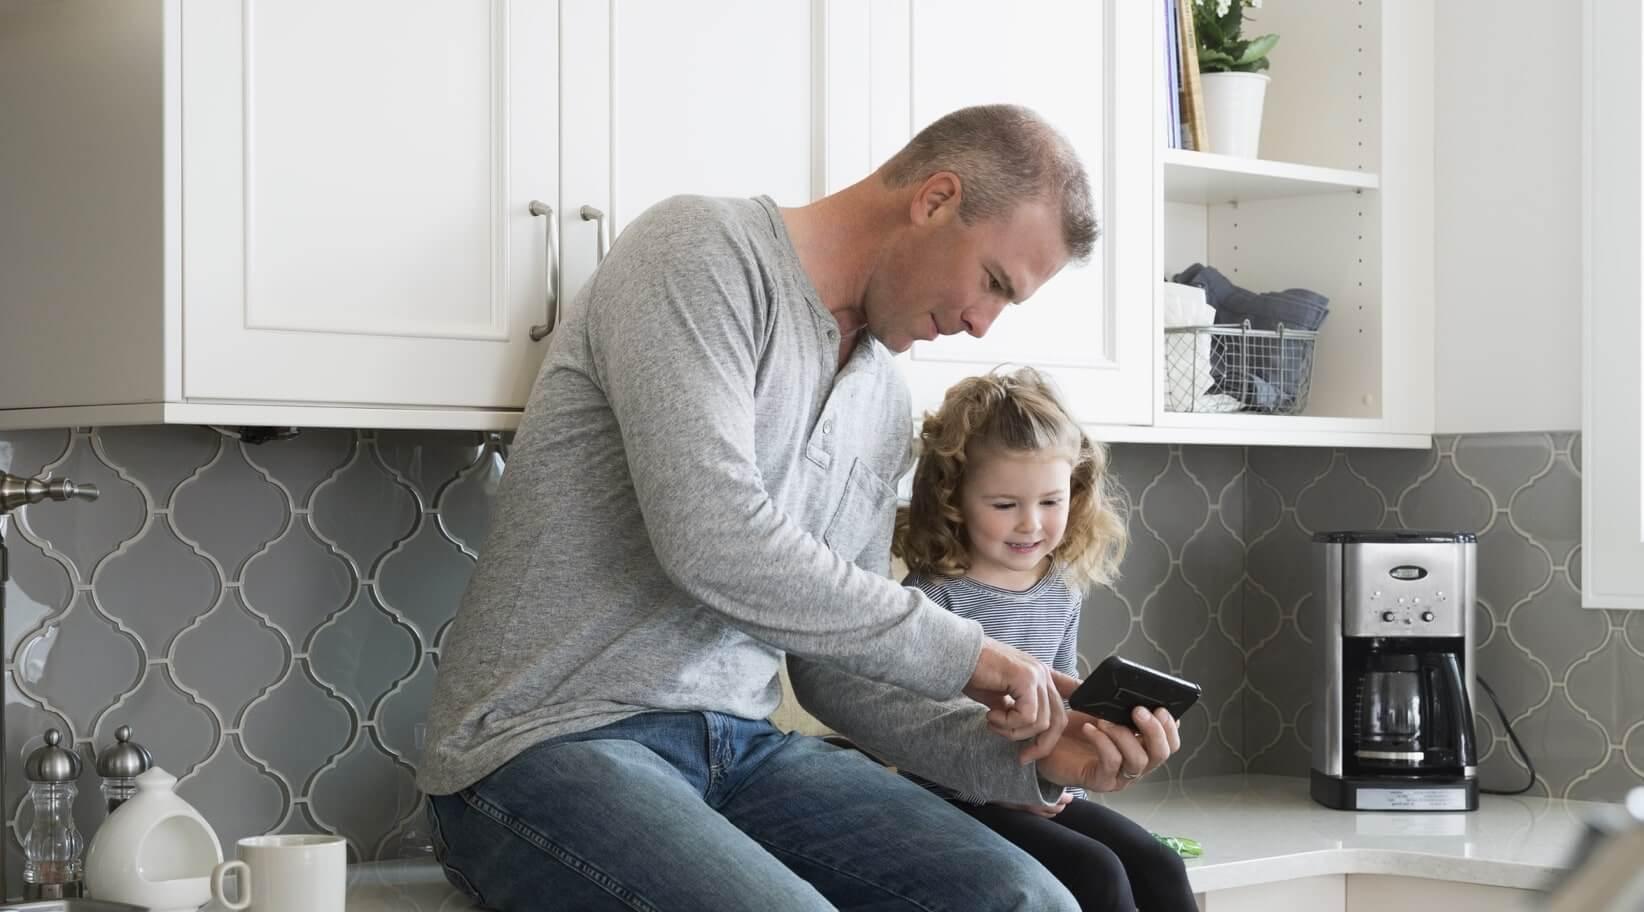 Father and child enjoying comfortable smart home